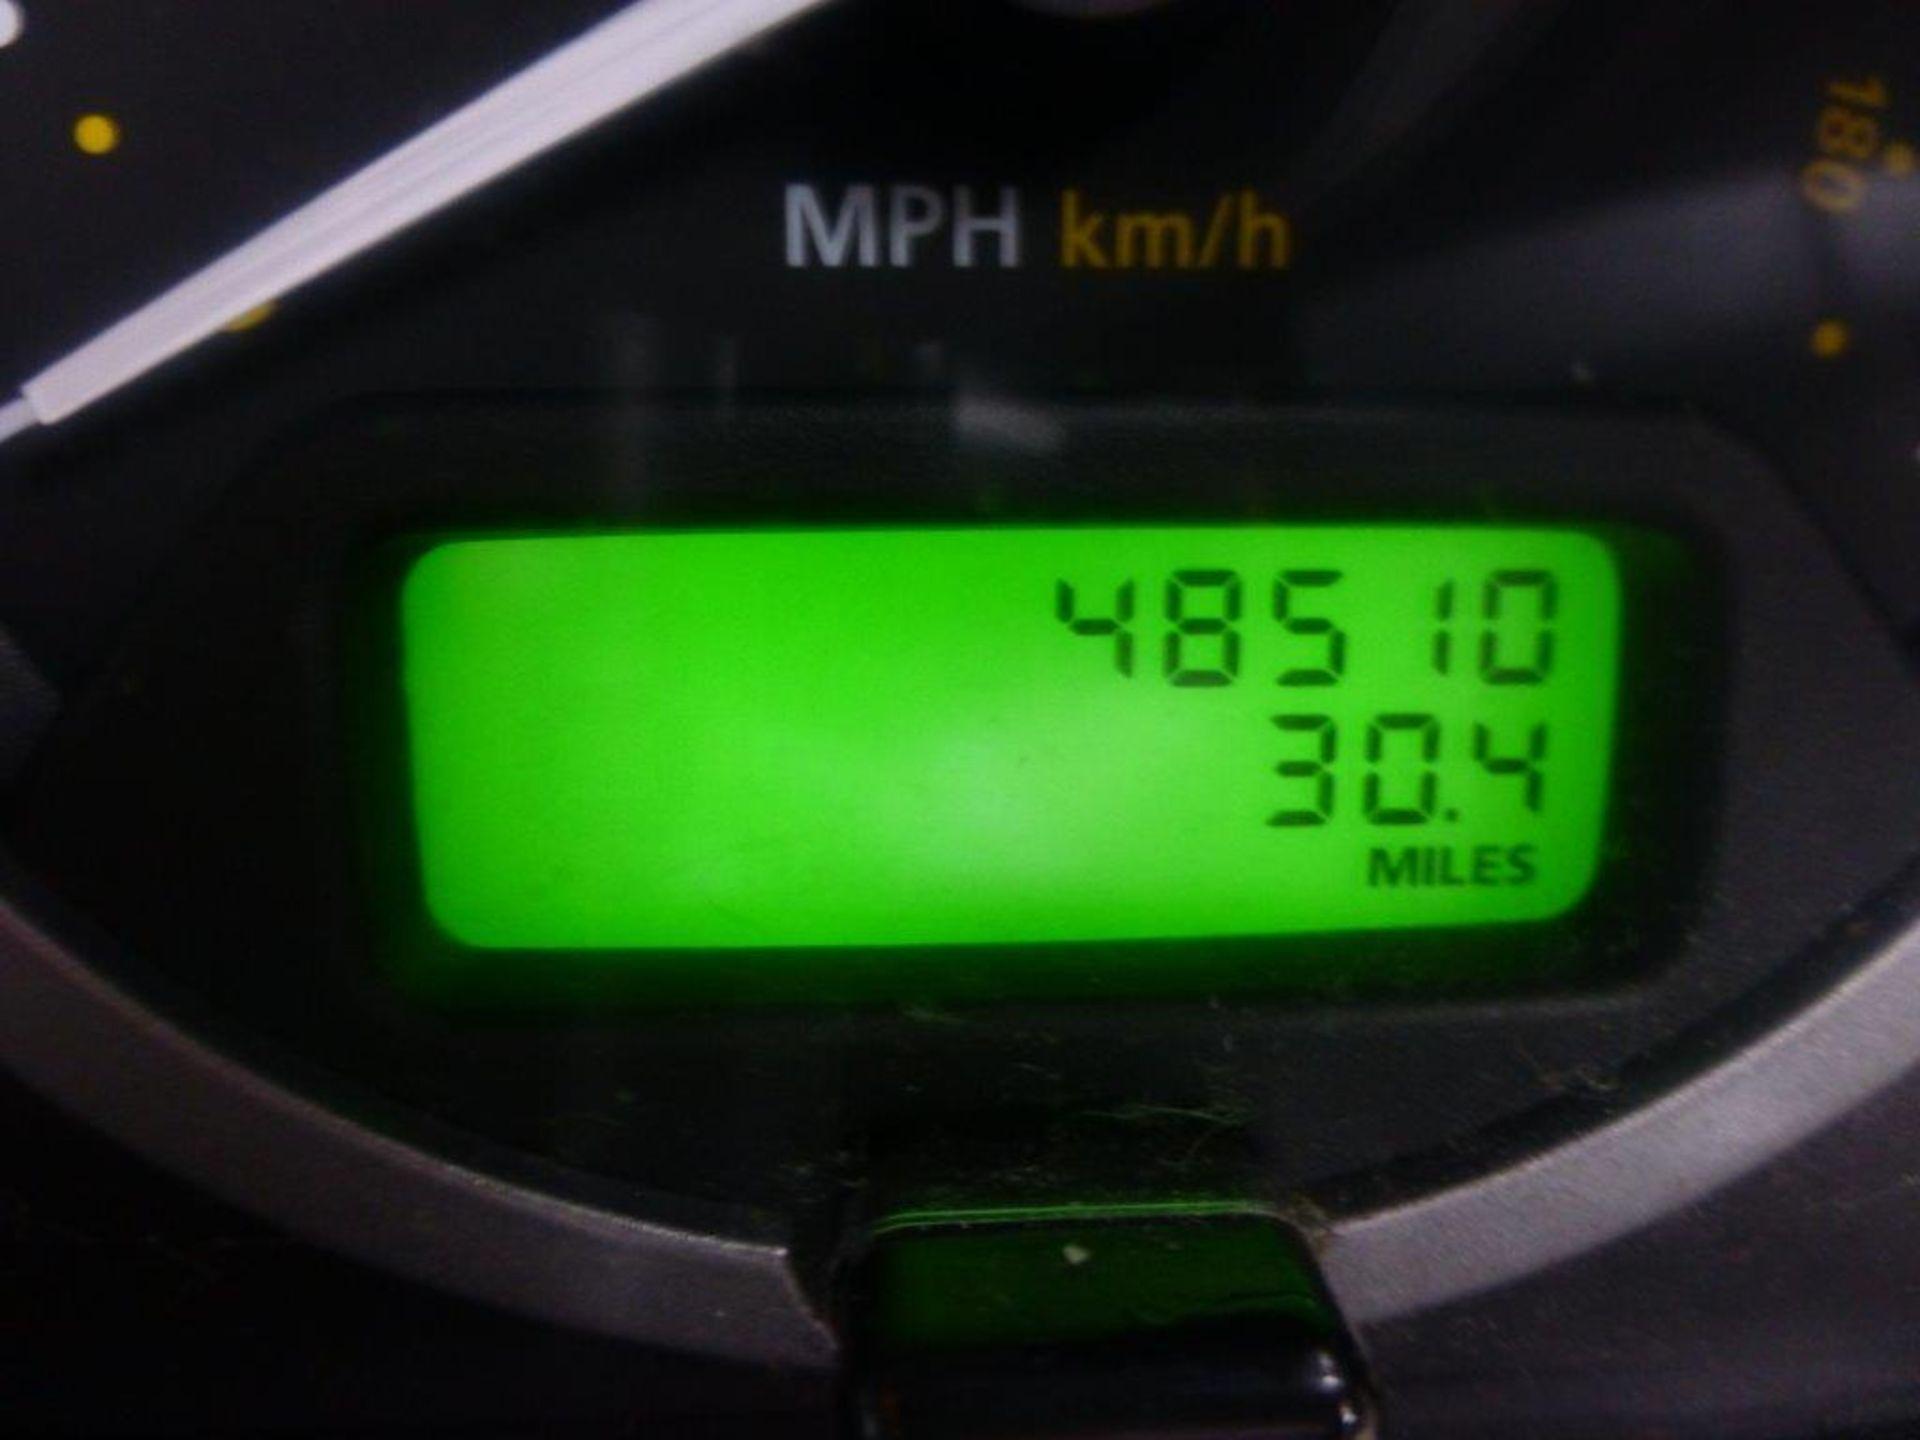 Land Rover Defender 110 XS Bowler double cab pickup TDCi (2.2). Reg no. T9 FNK. Reg. date 23/03/ - Image 11 of 13